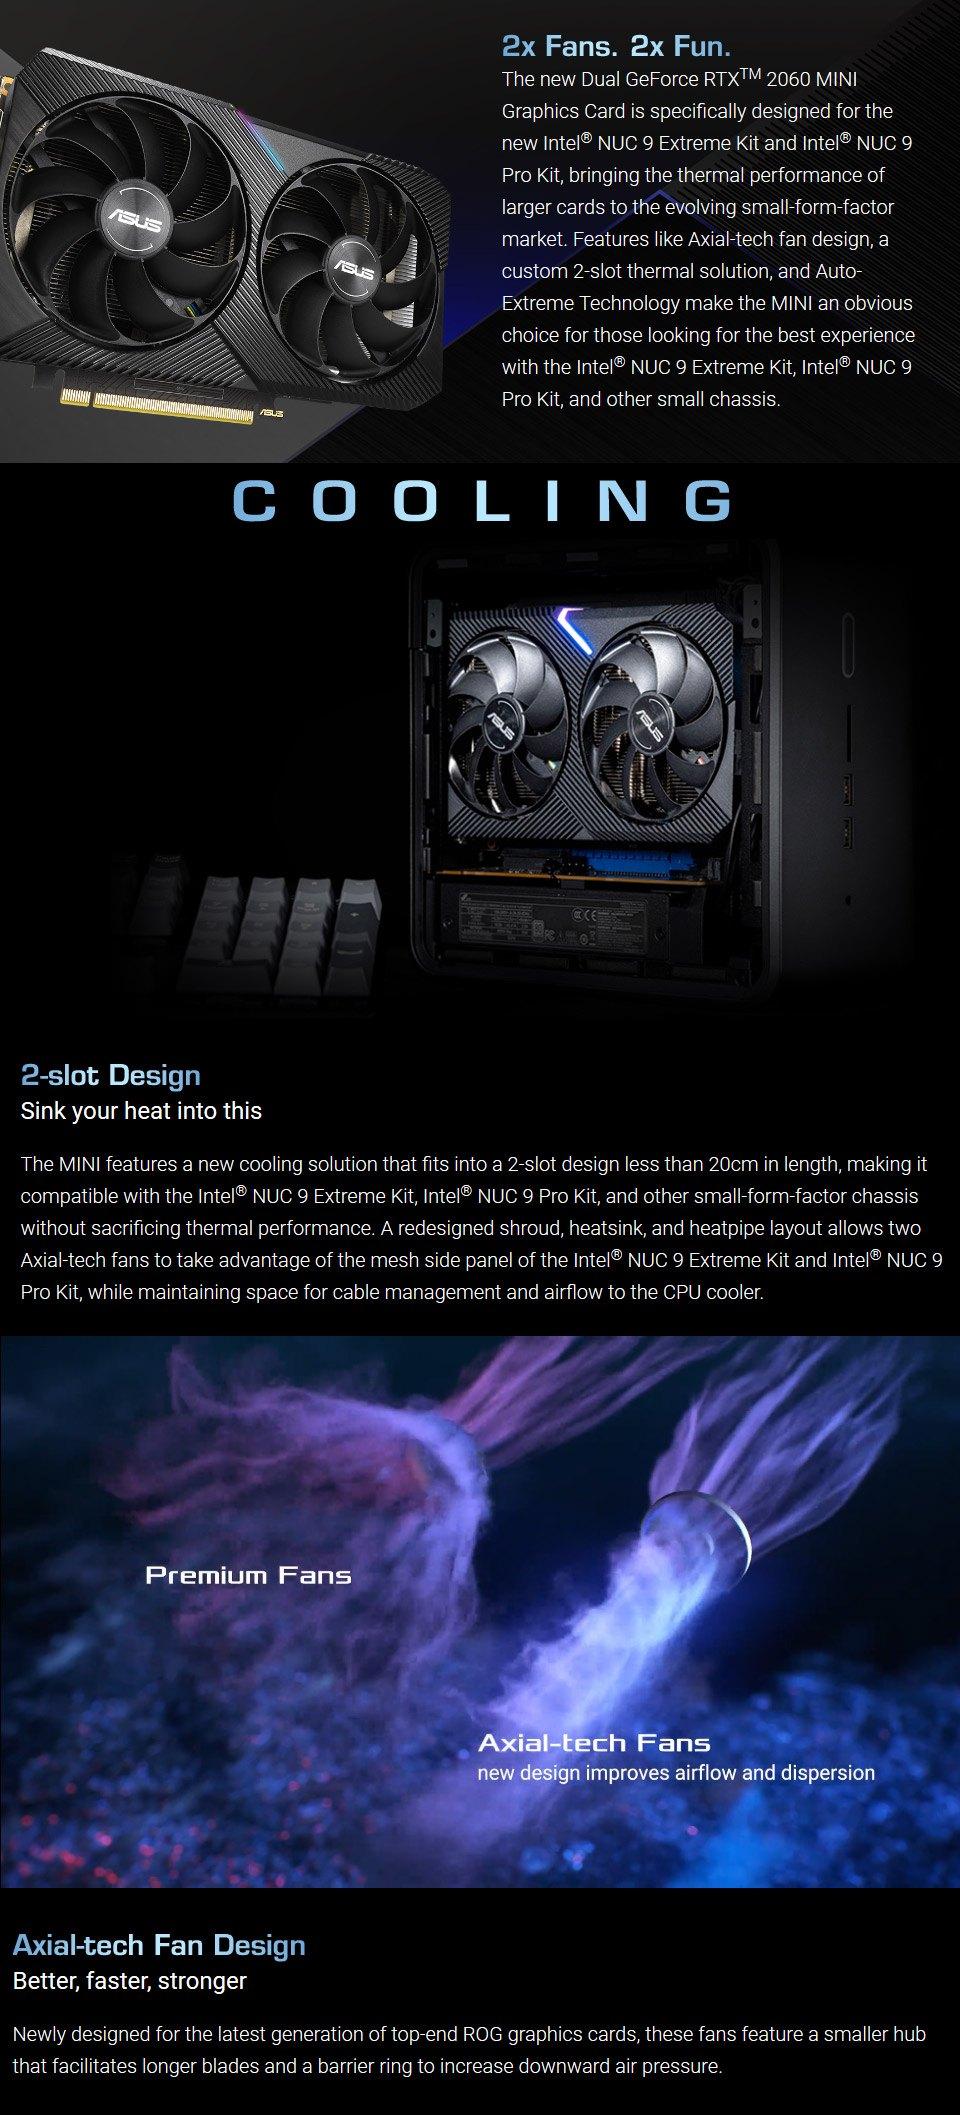 ASUS GeForce RTX 2060 Dual OC Mini 6GB features